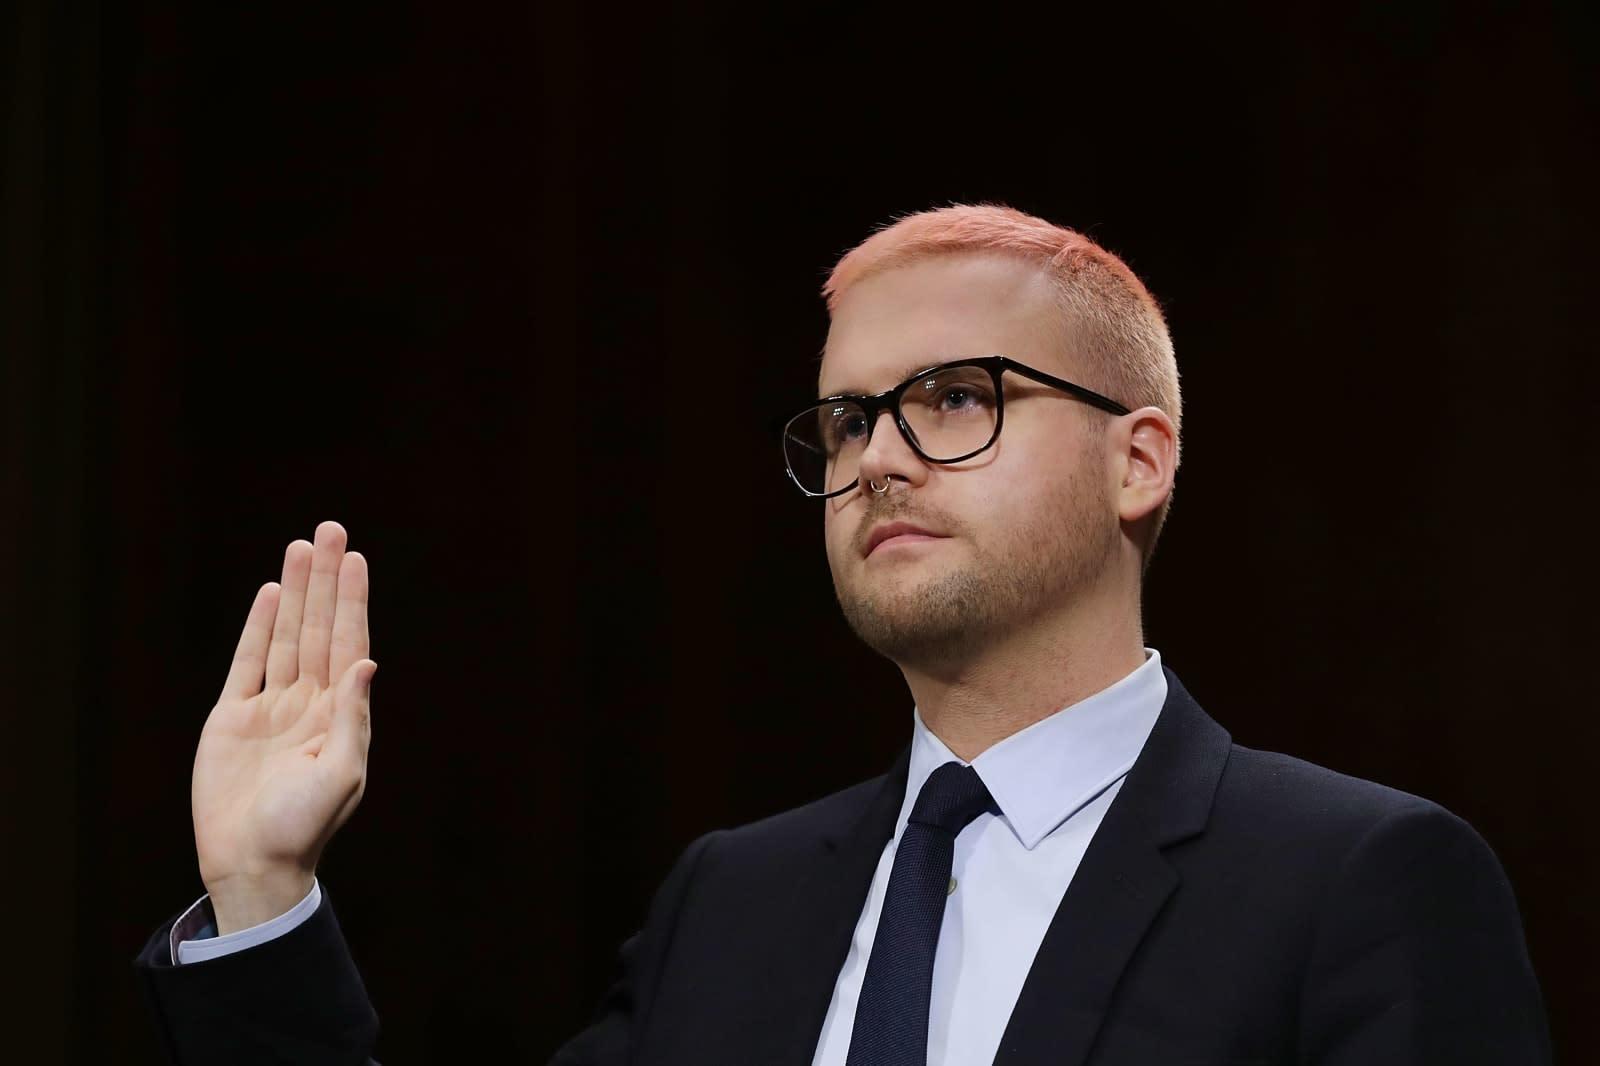 Cambridge Analytica Whistleblower Christopher Wylie Testifies To Senate Judiciary Committee On Cambridge Analytica And Data Priv